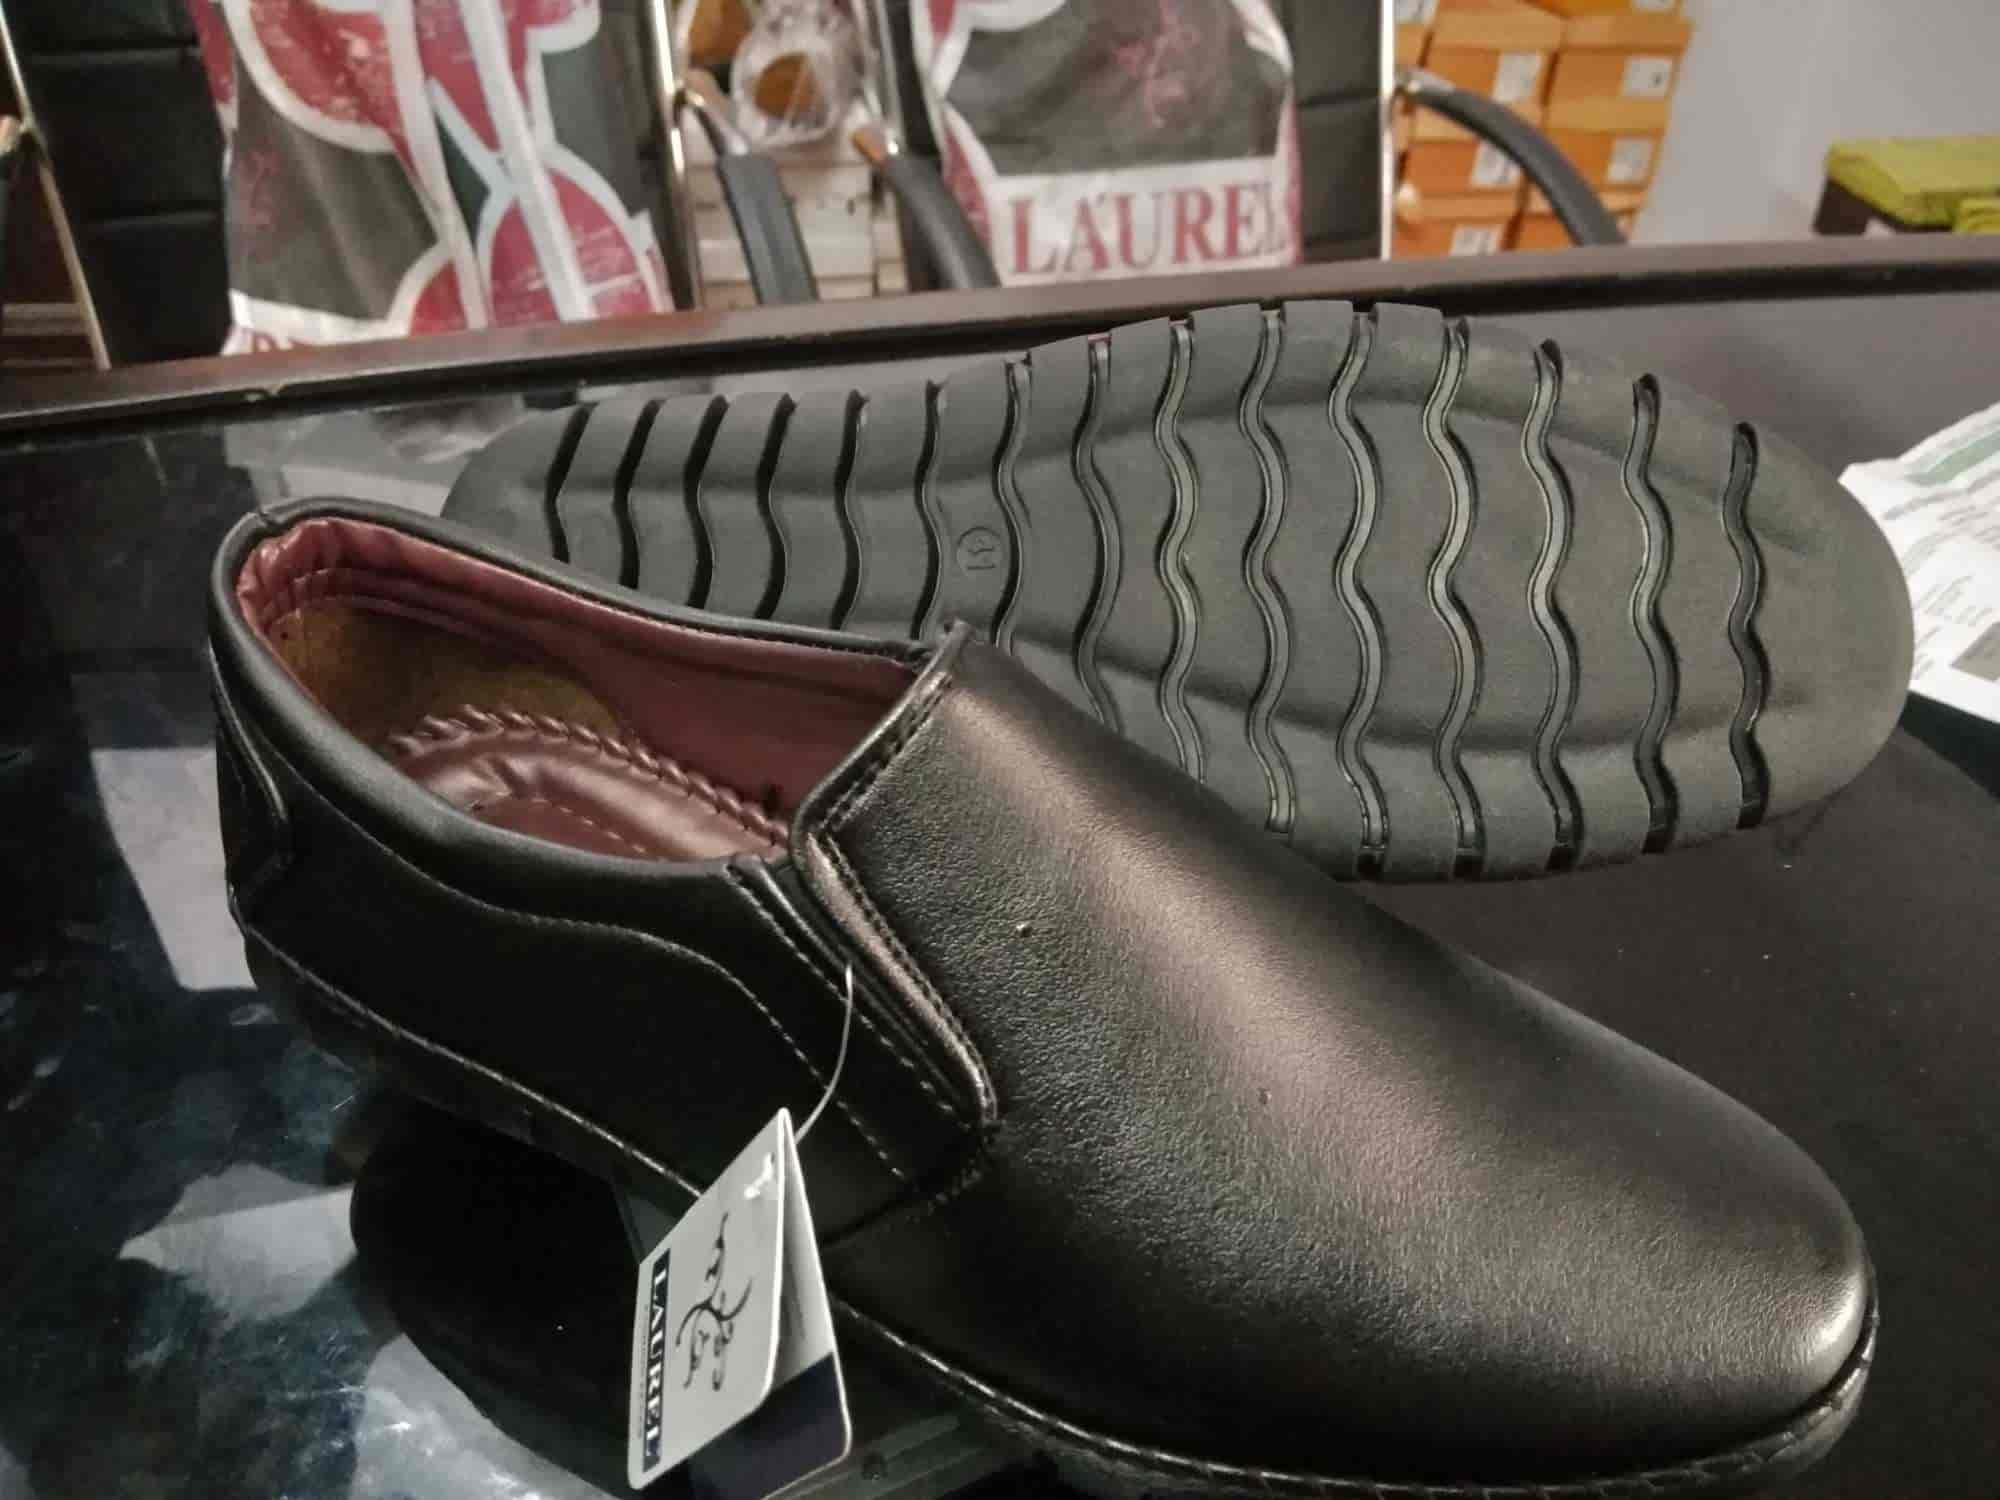 Cheap Shoe Store India Pvt Ltd, Tilak